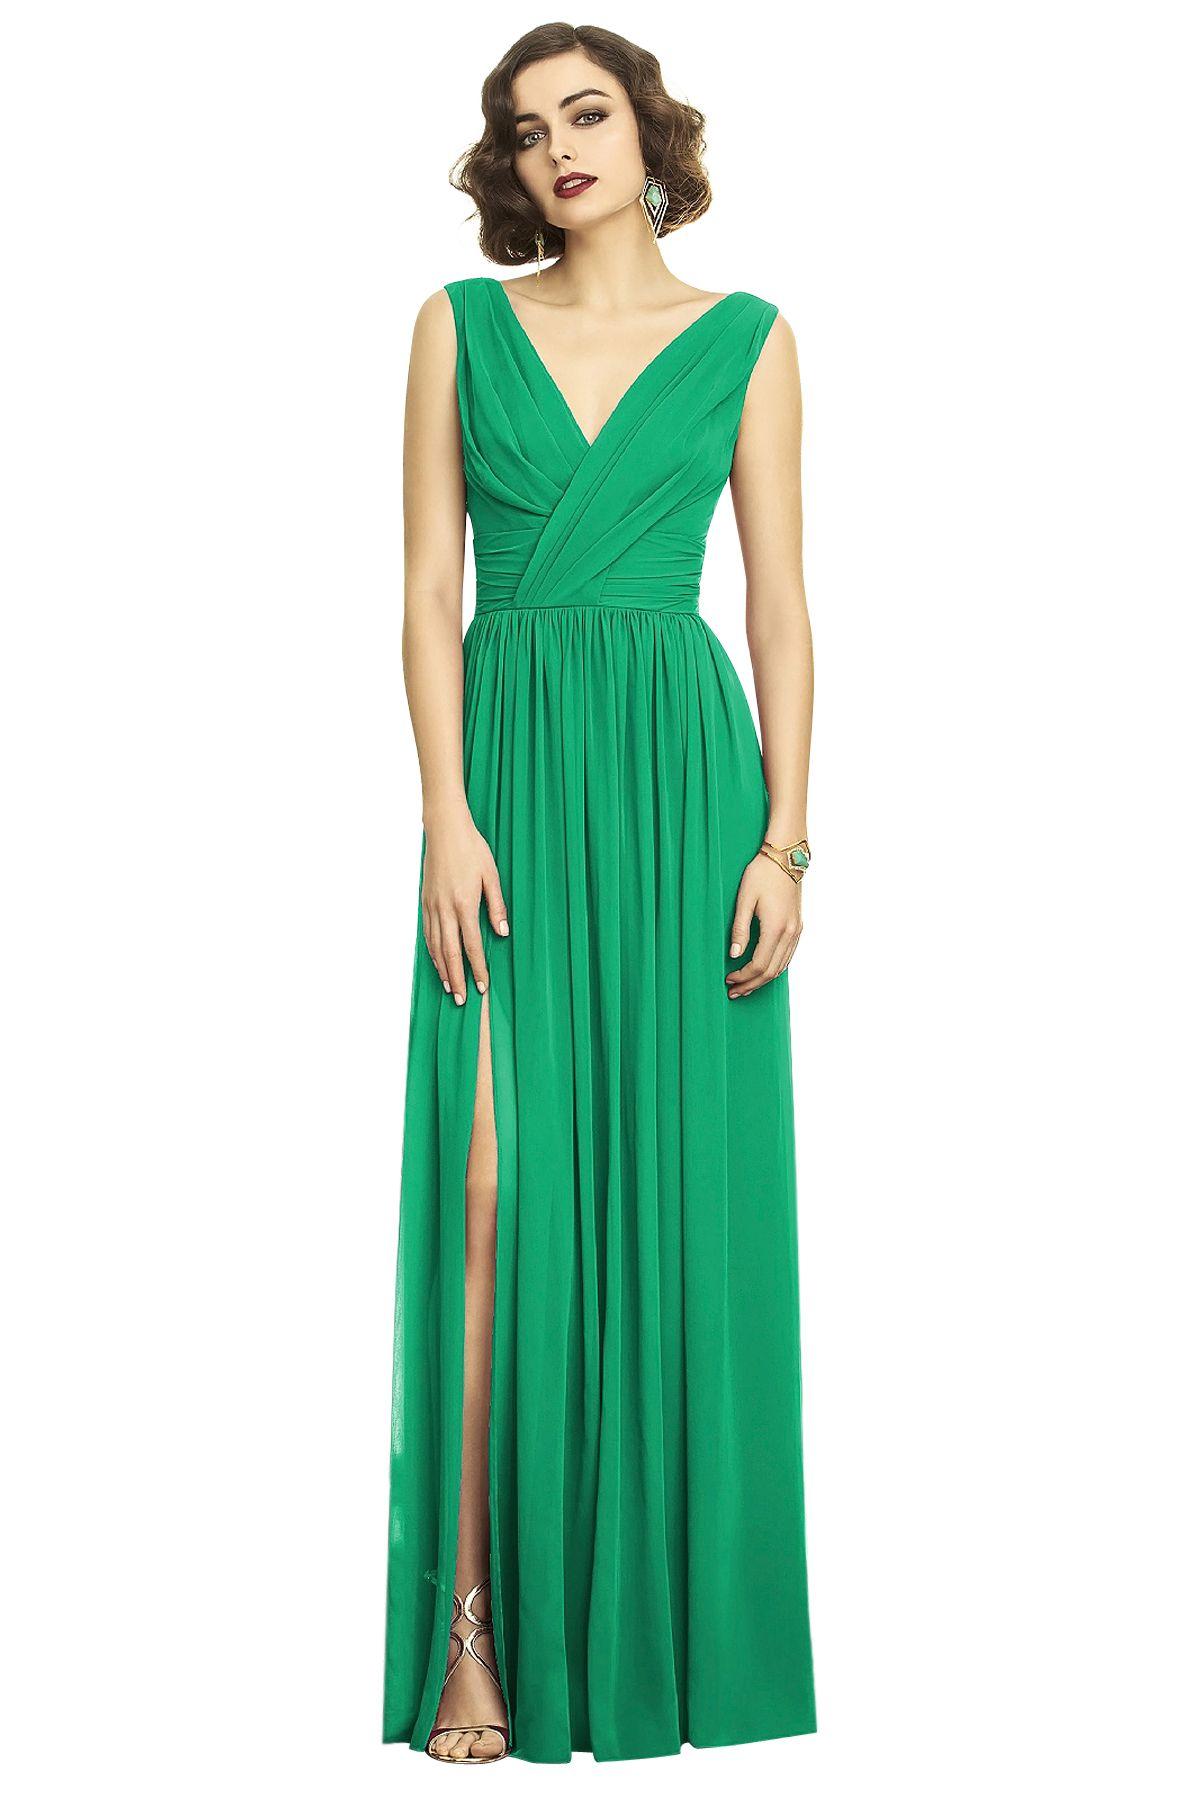 Shop dessy bridesmaid dress in lux chiffon at weddington way